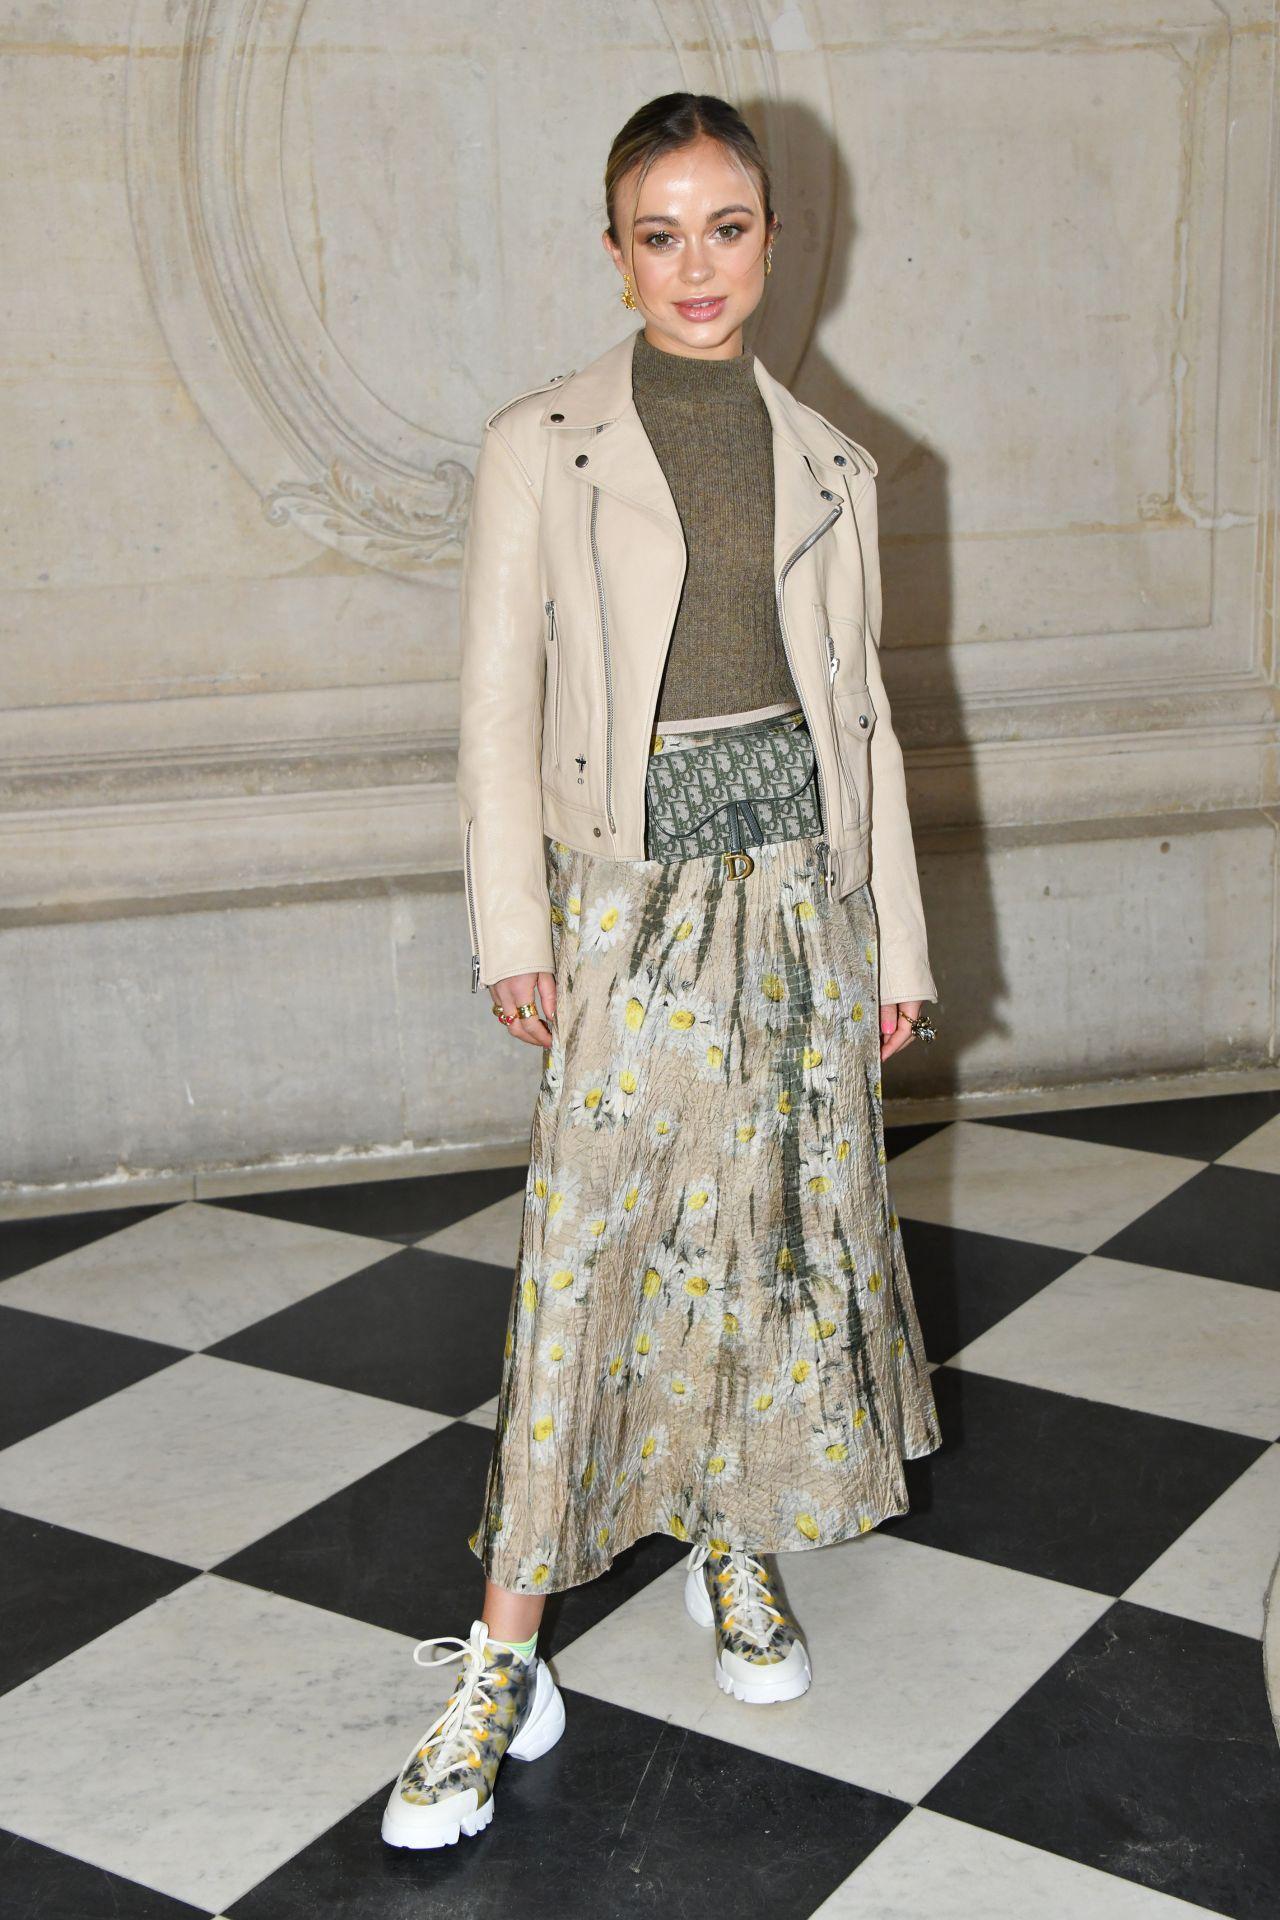 Paris Fashion Week: Christian Dior Spring 2019 Collection